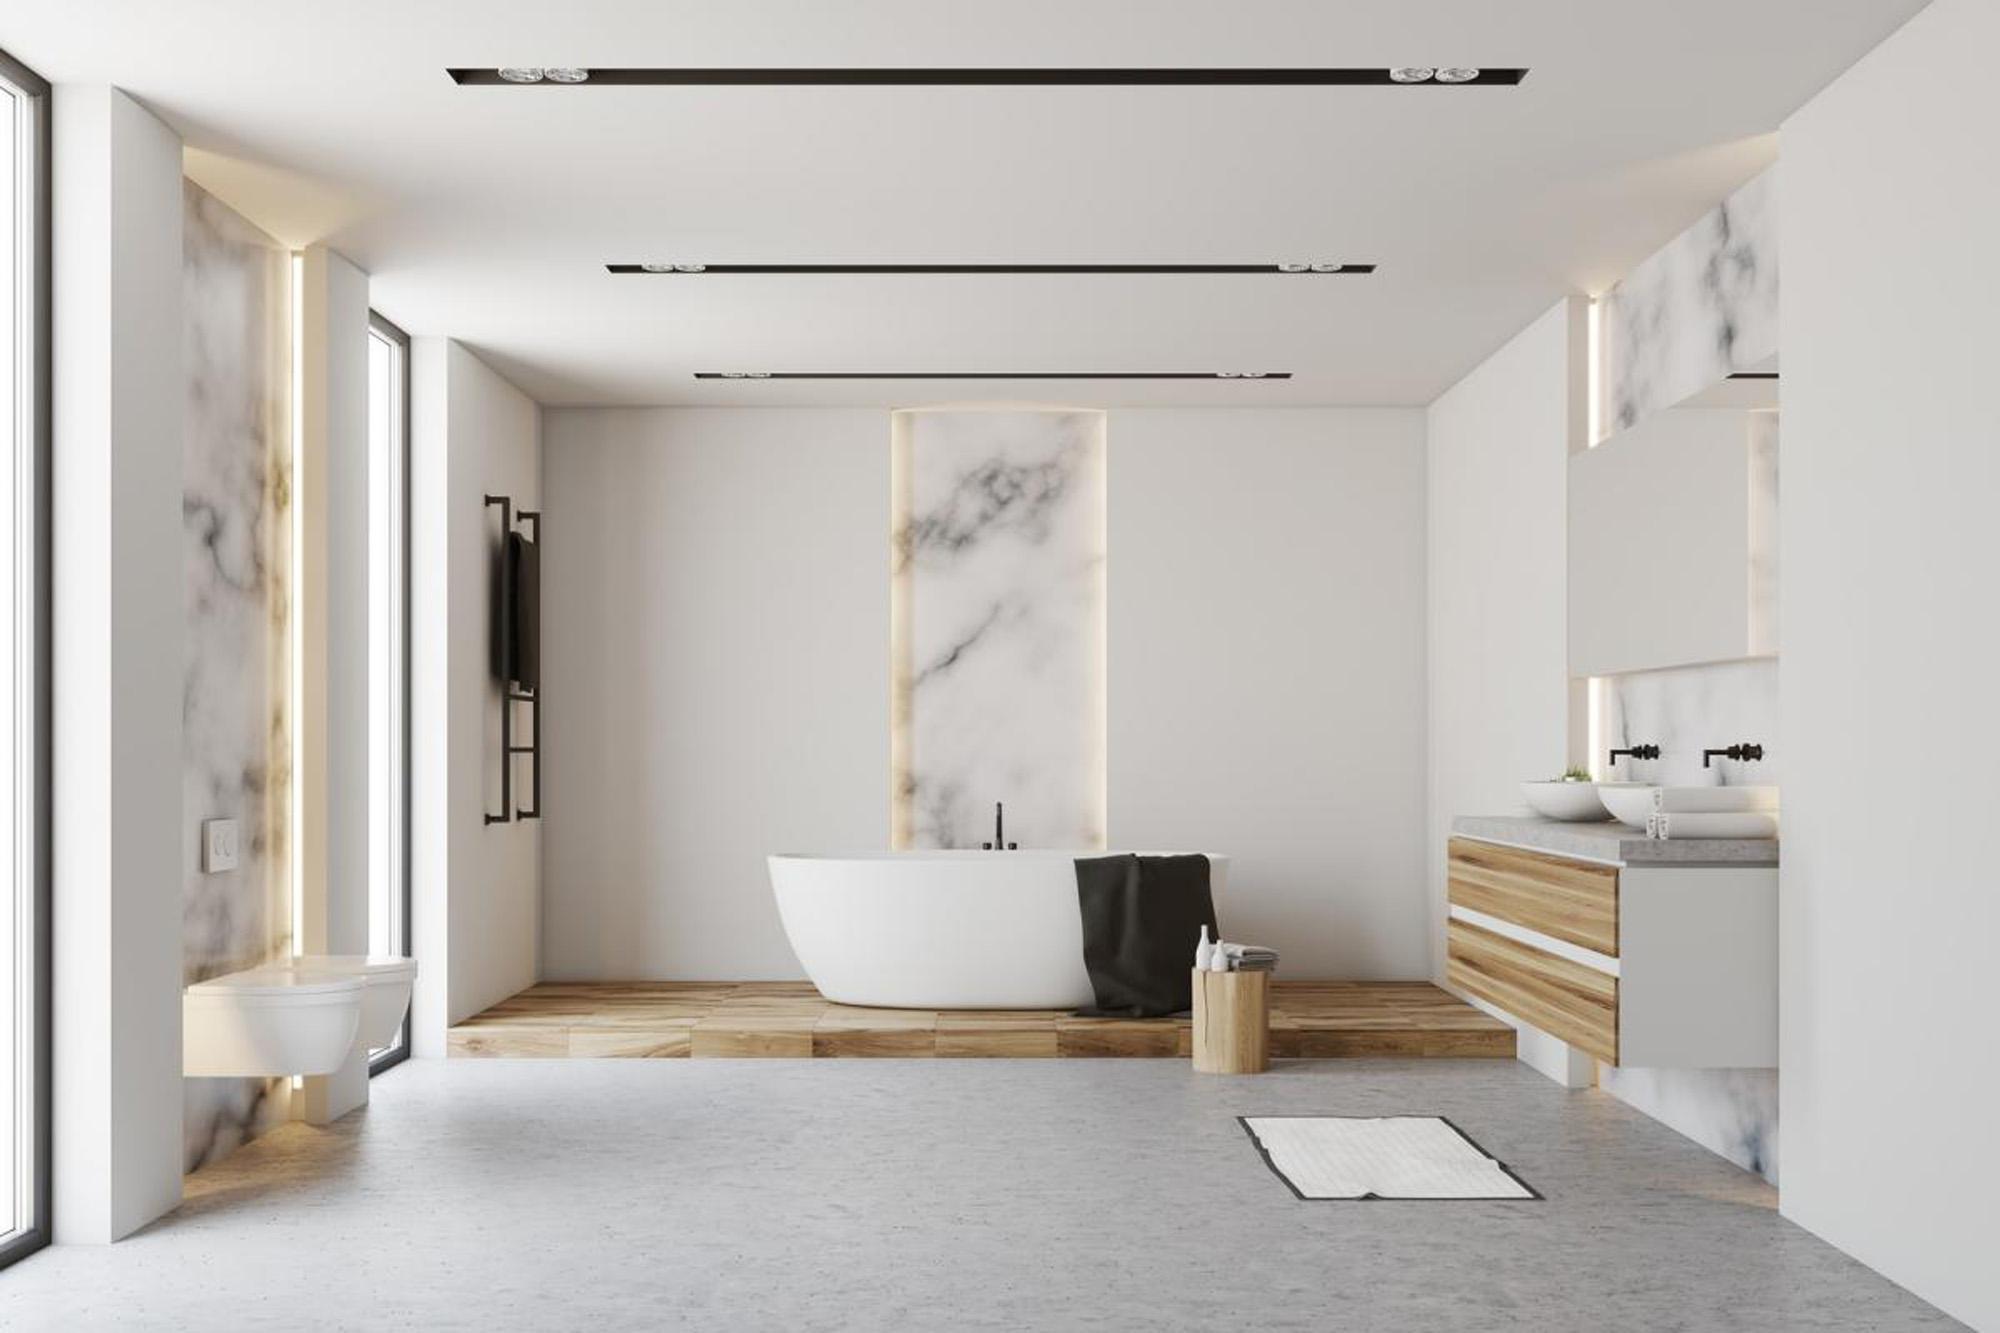 Mur salle de bain en marbre